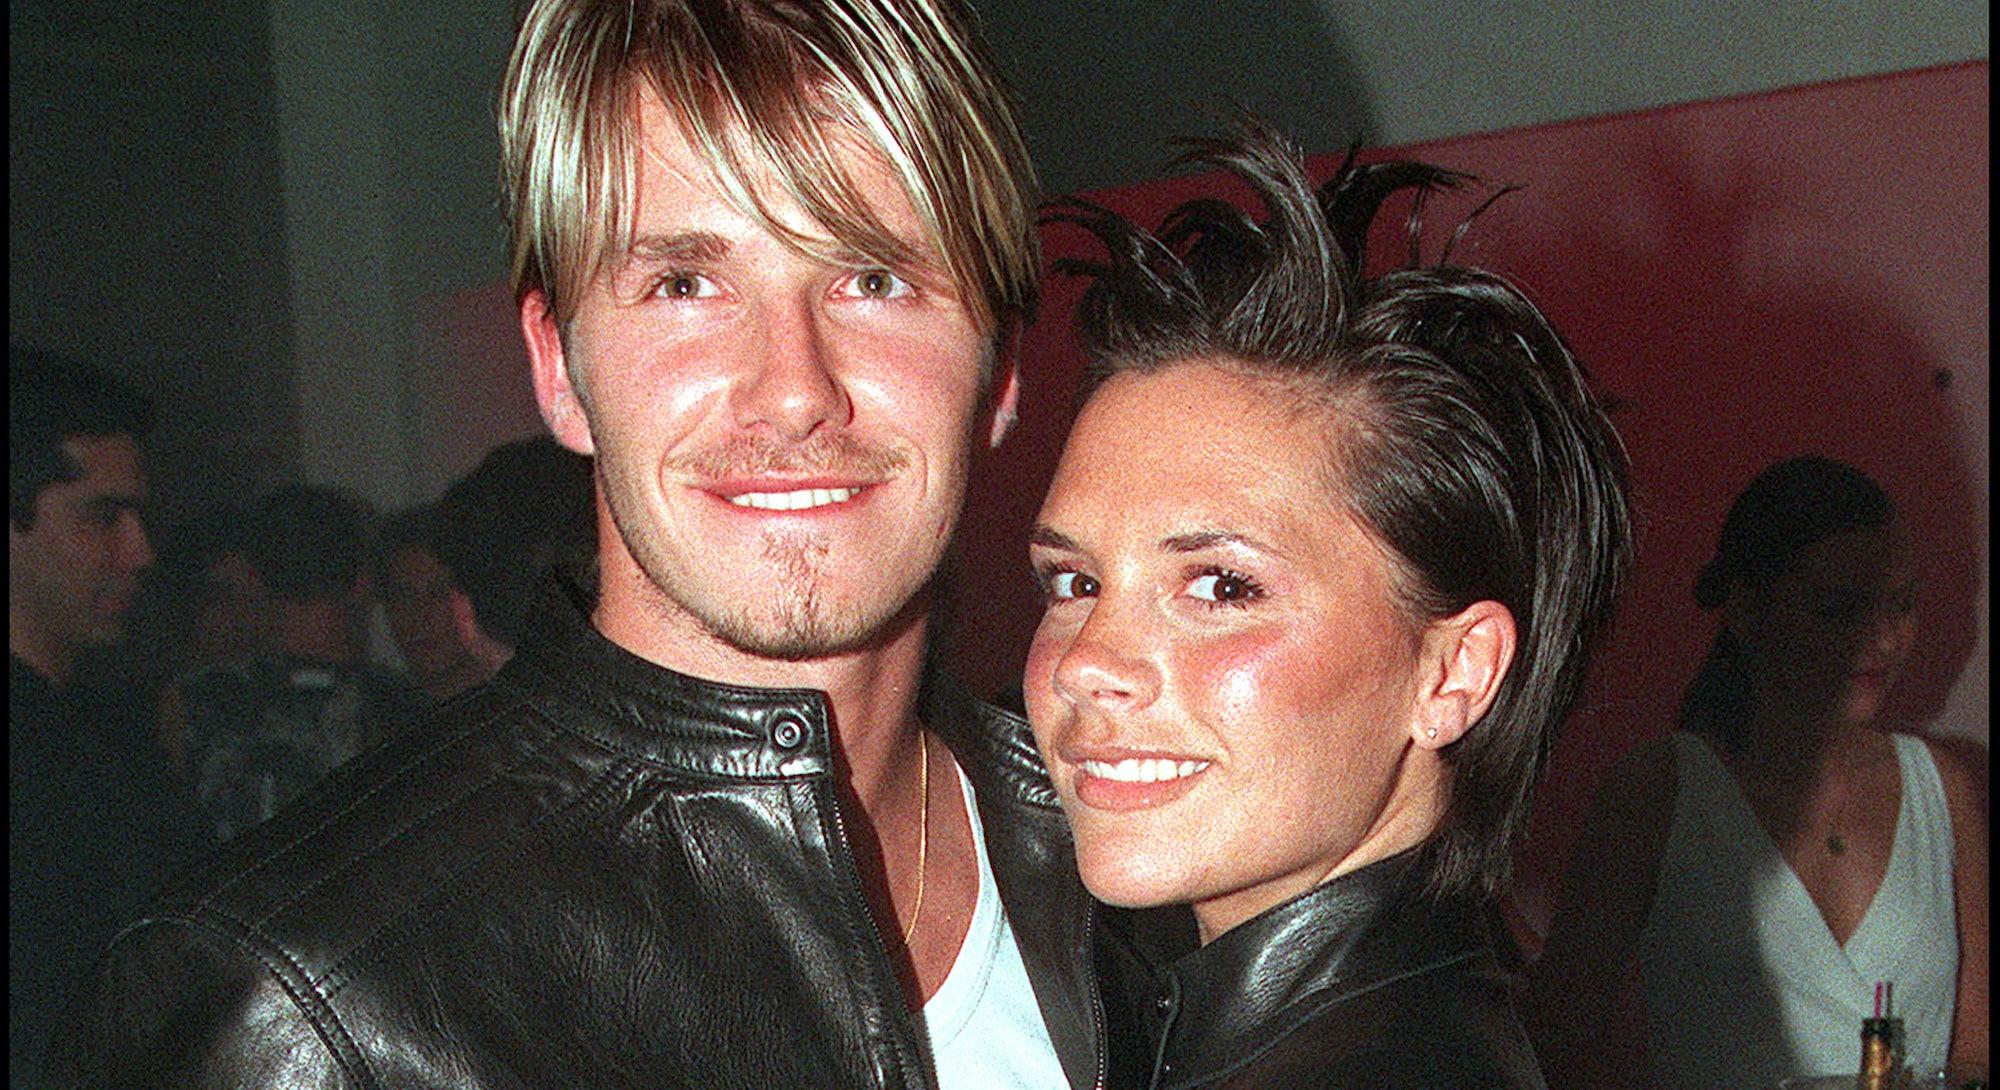 LONDON - JUNE 11: British footballer David Beckham and wife Victoria Beckham attend the Versace Stor...